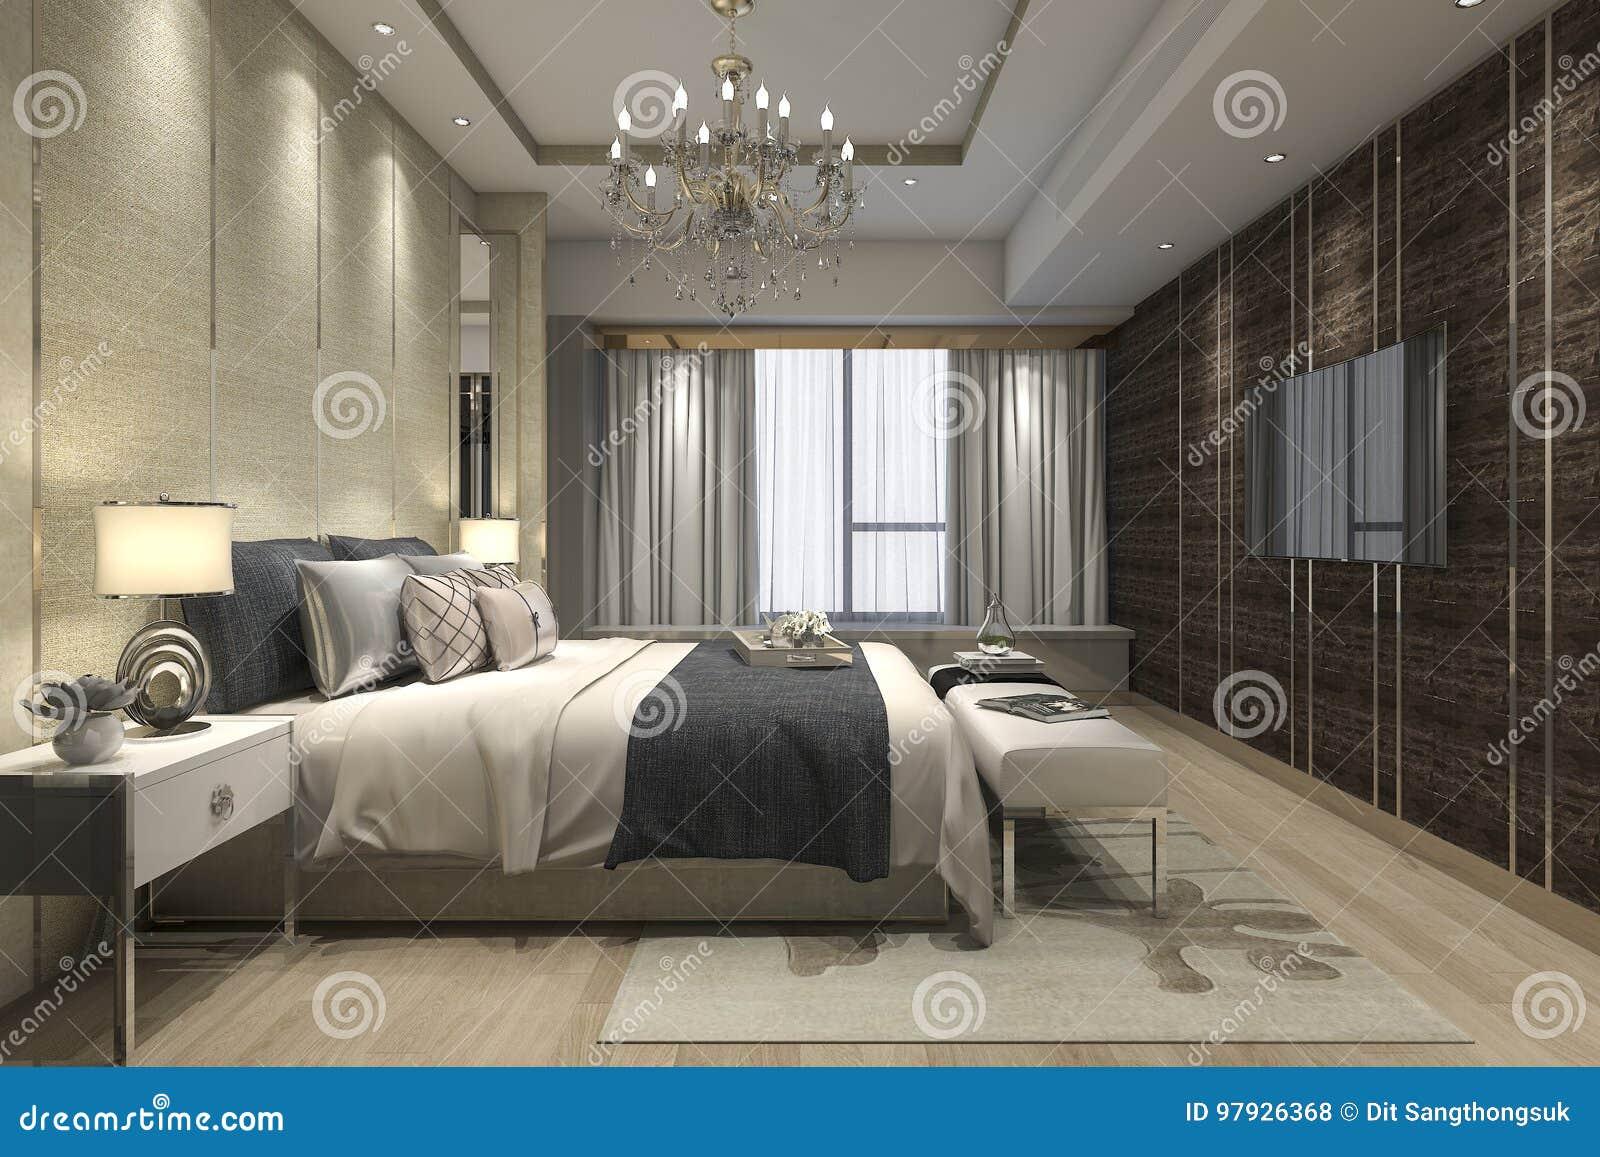 Luxe Slaapkamer Kast : D teruggevende luxe moderne slaapkamerreeks in hotel met